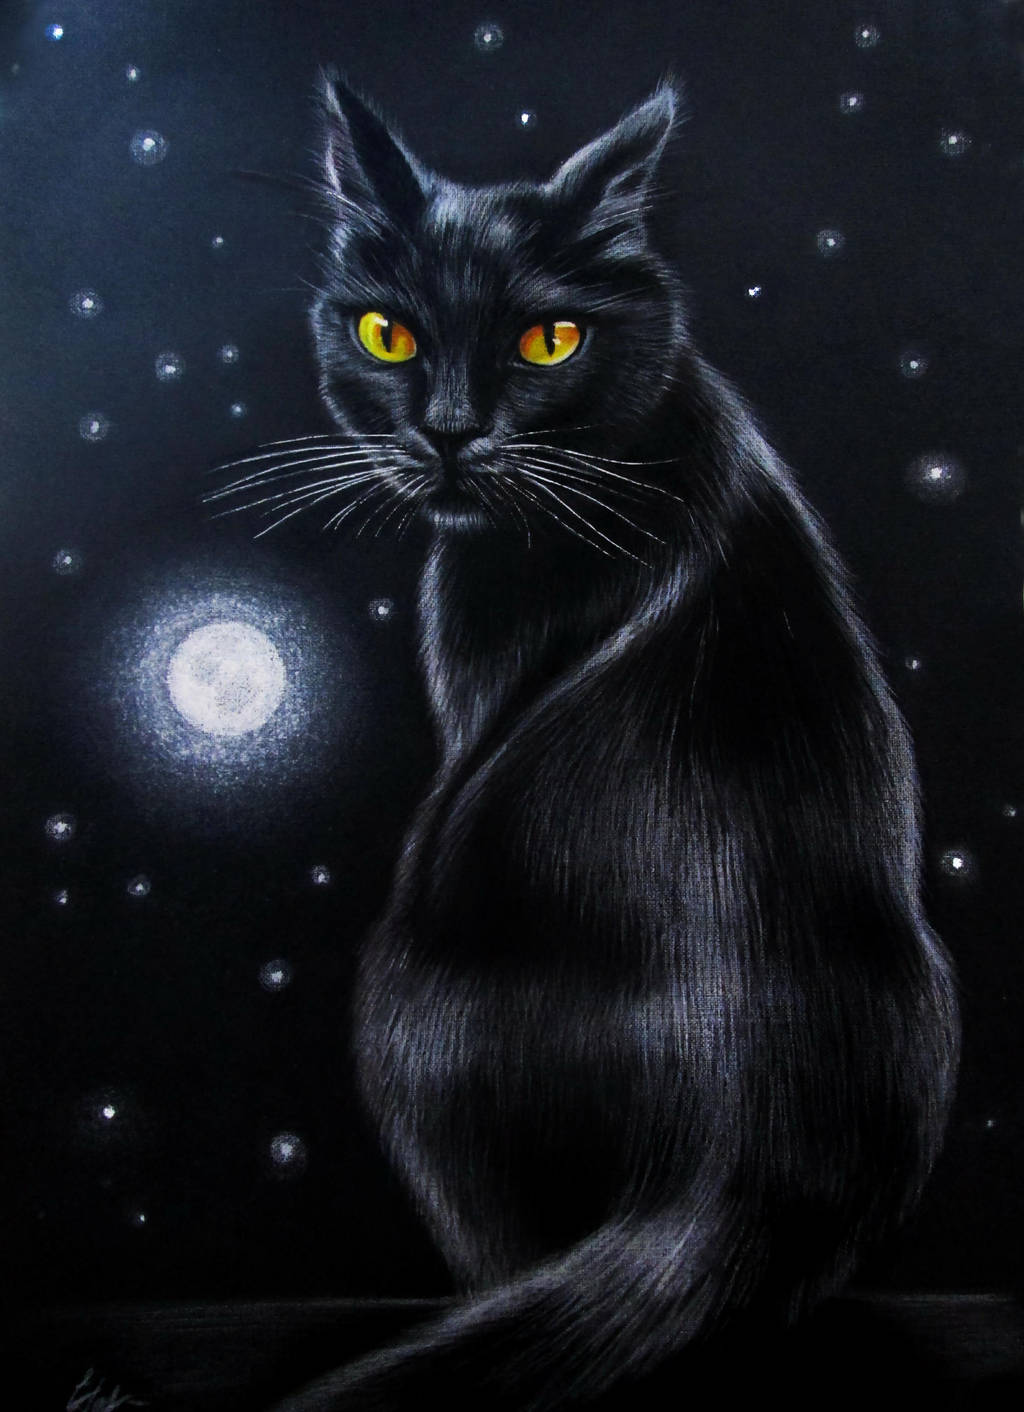 Moon Cat by evlena